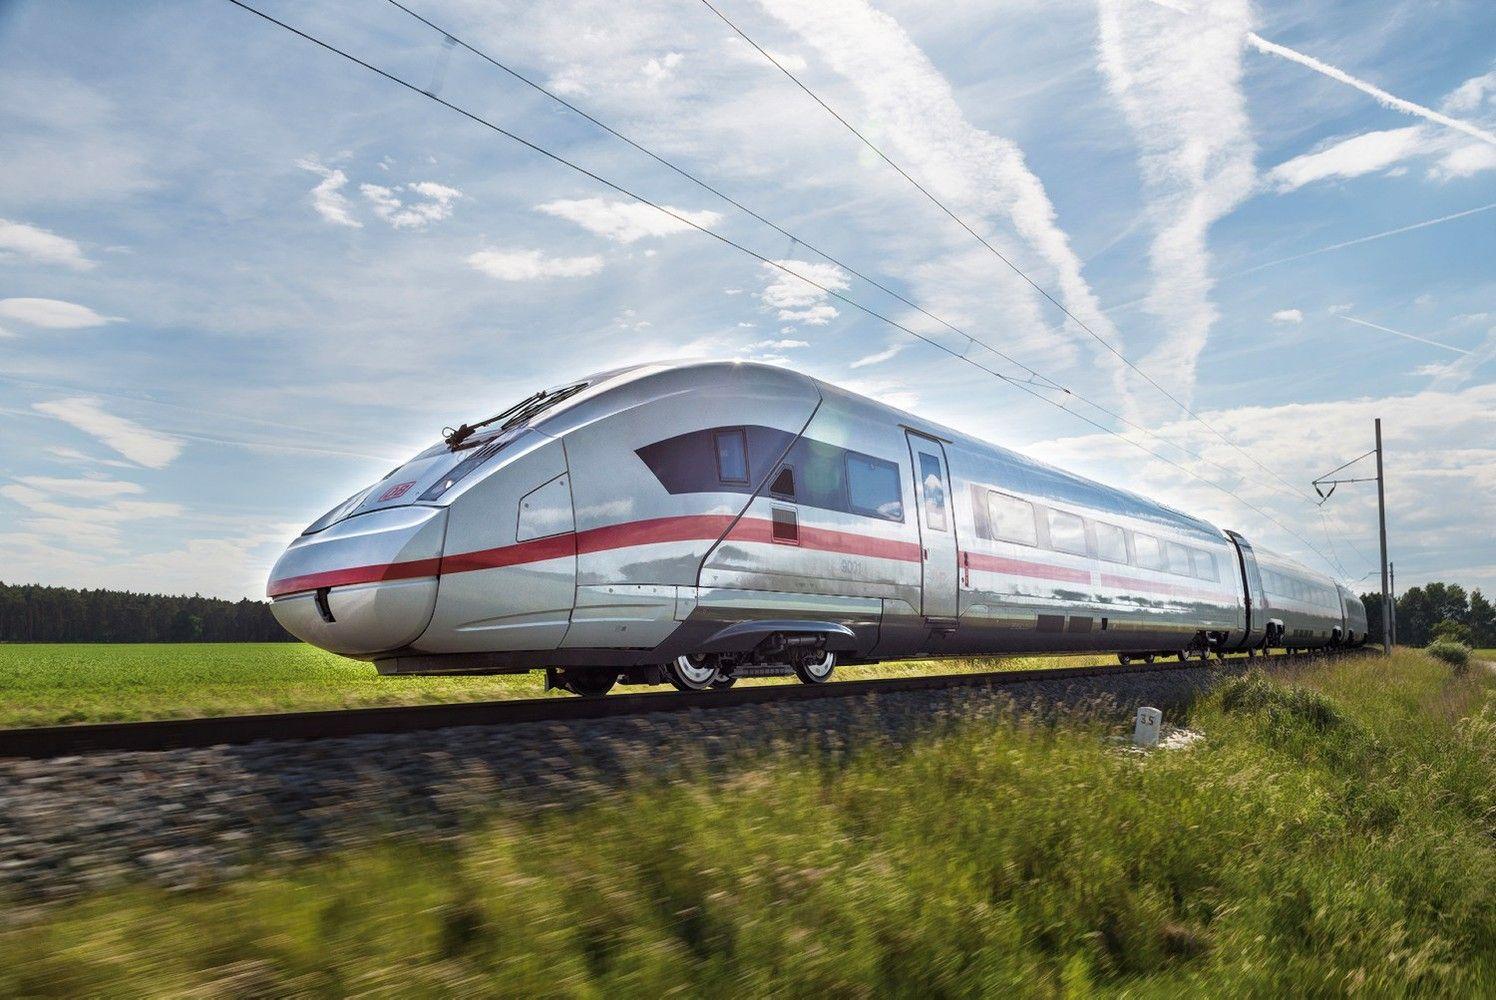 Elektra paremta transporto ateitis